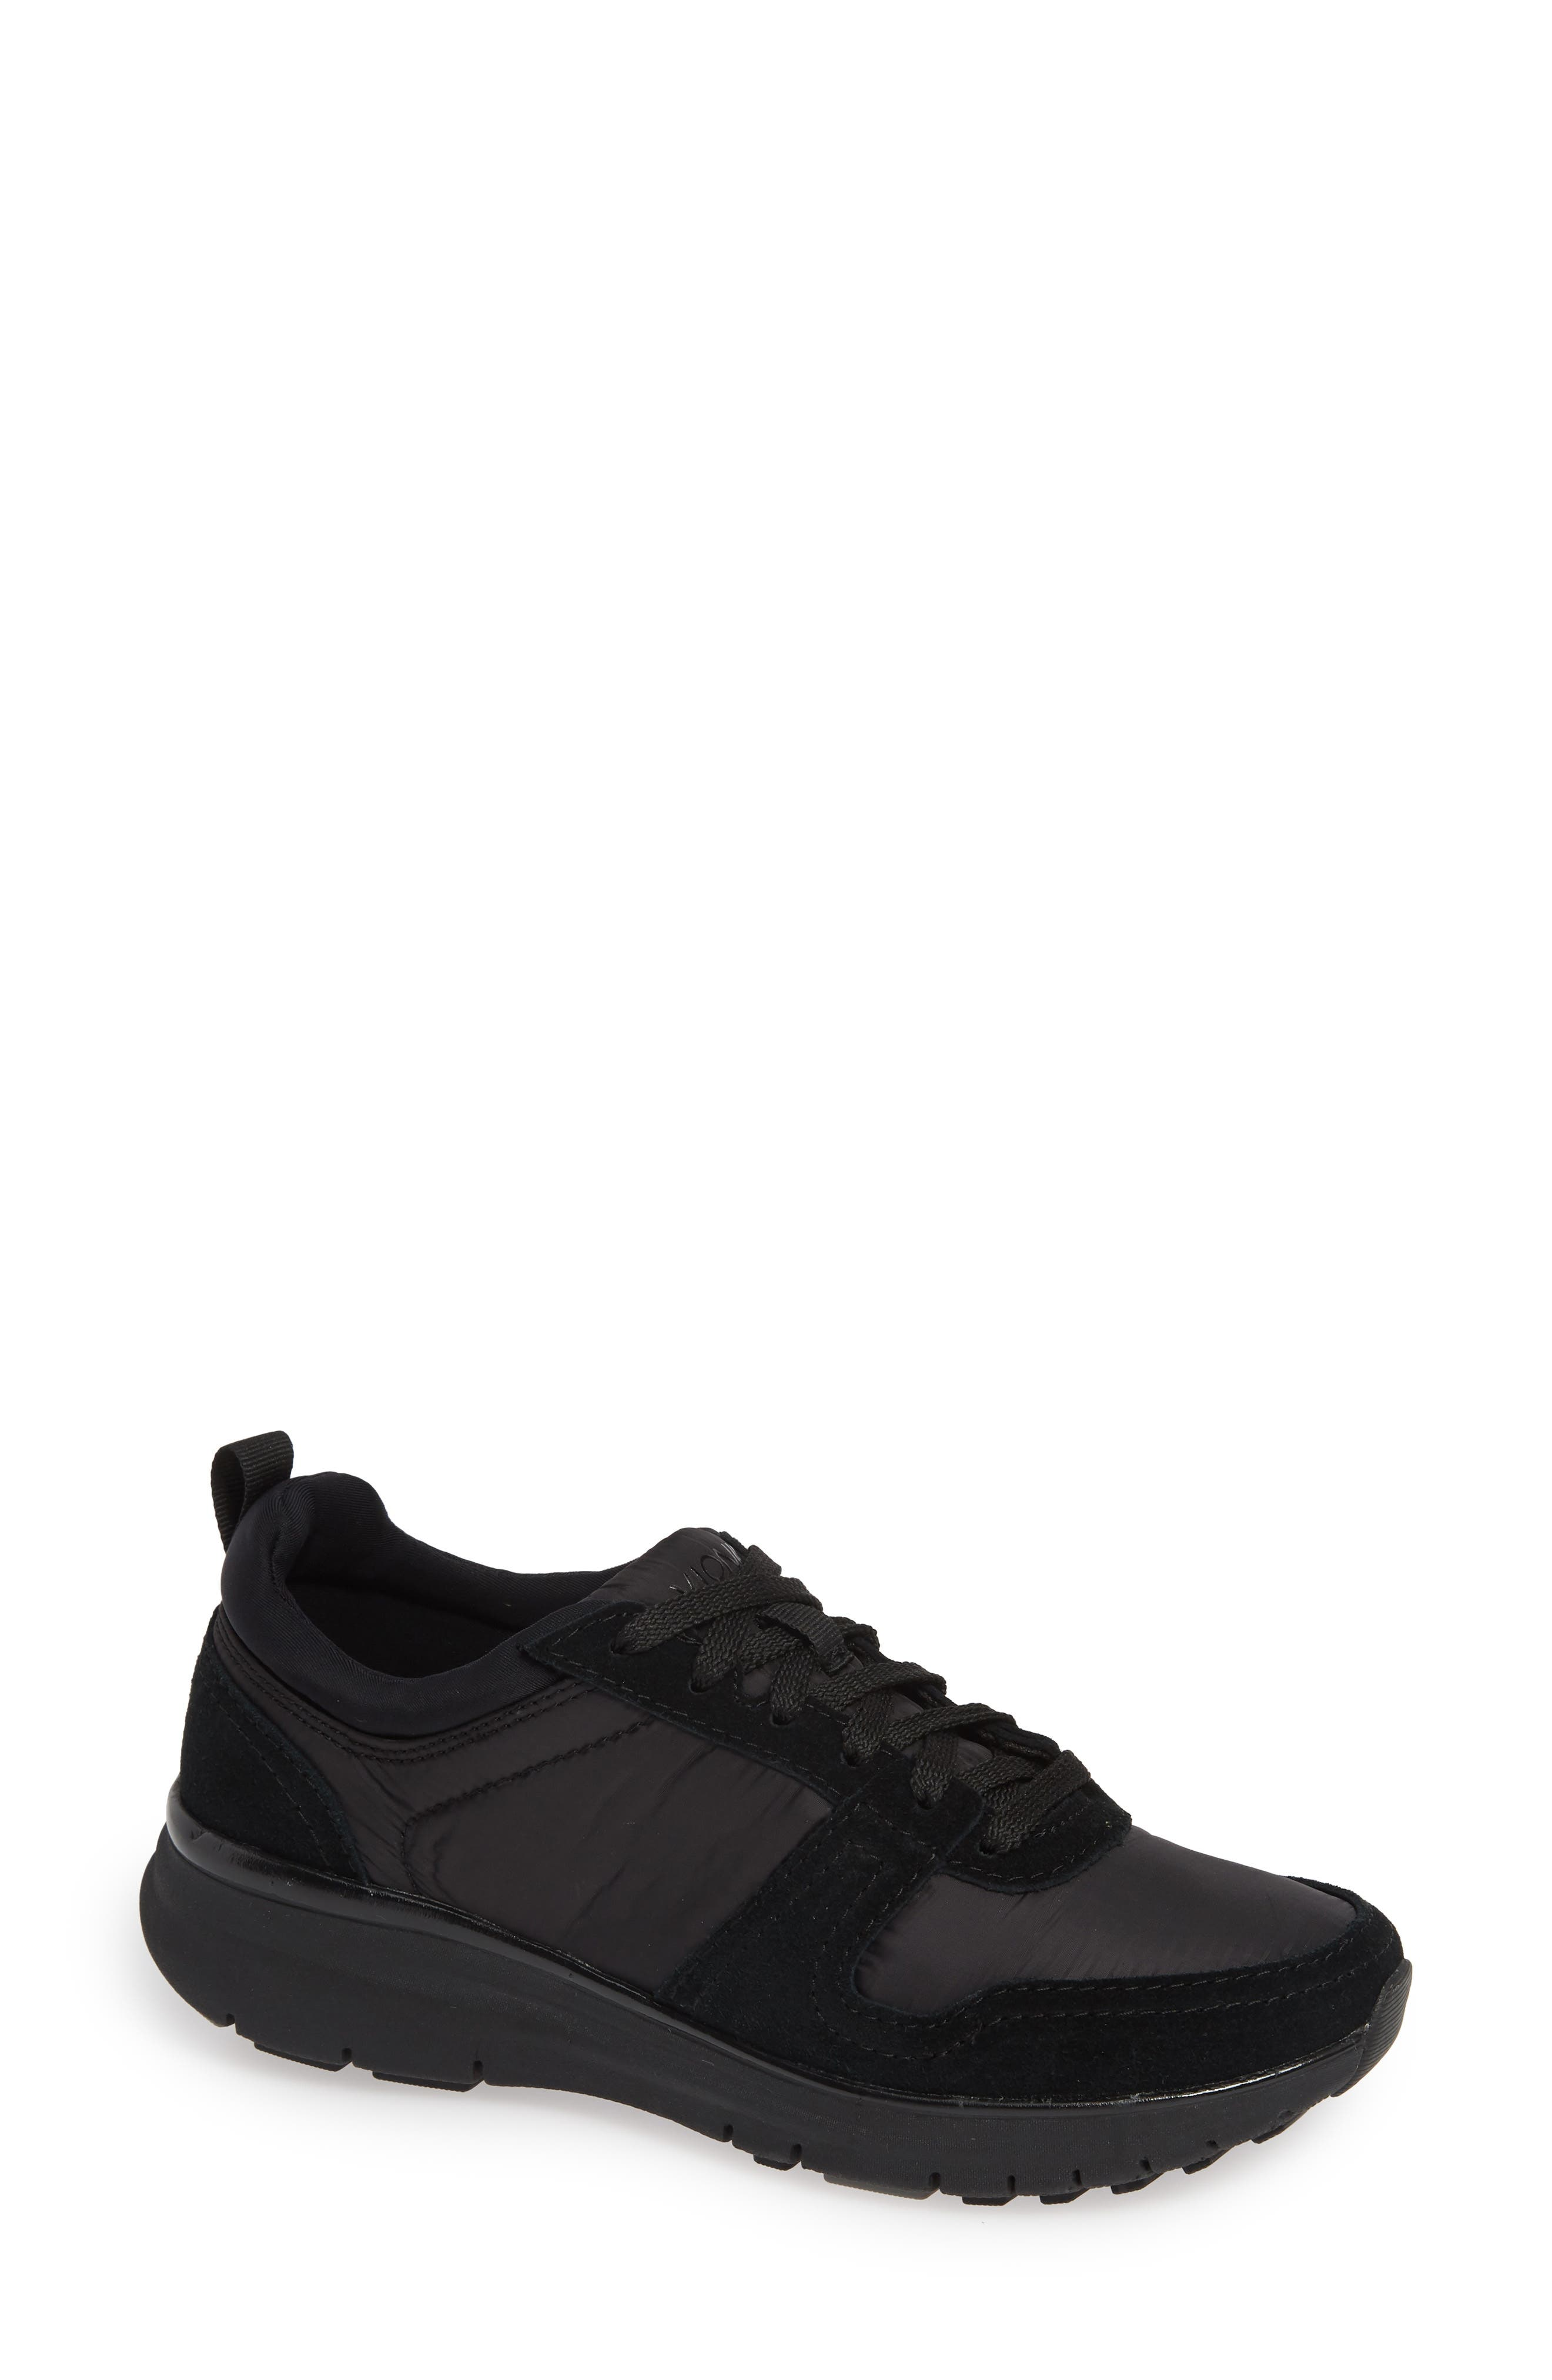 VIONIC Emerson Low Top Sneaker, Main, color, 001